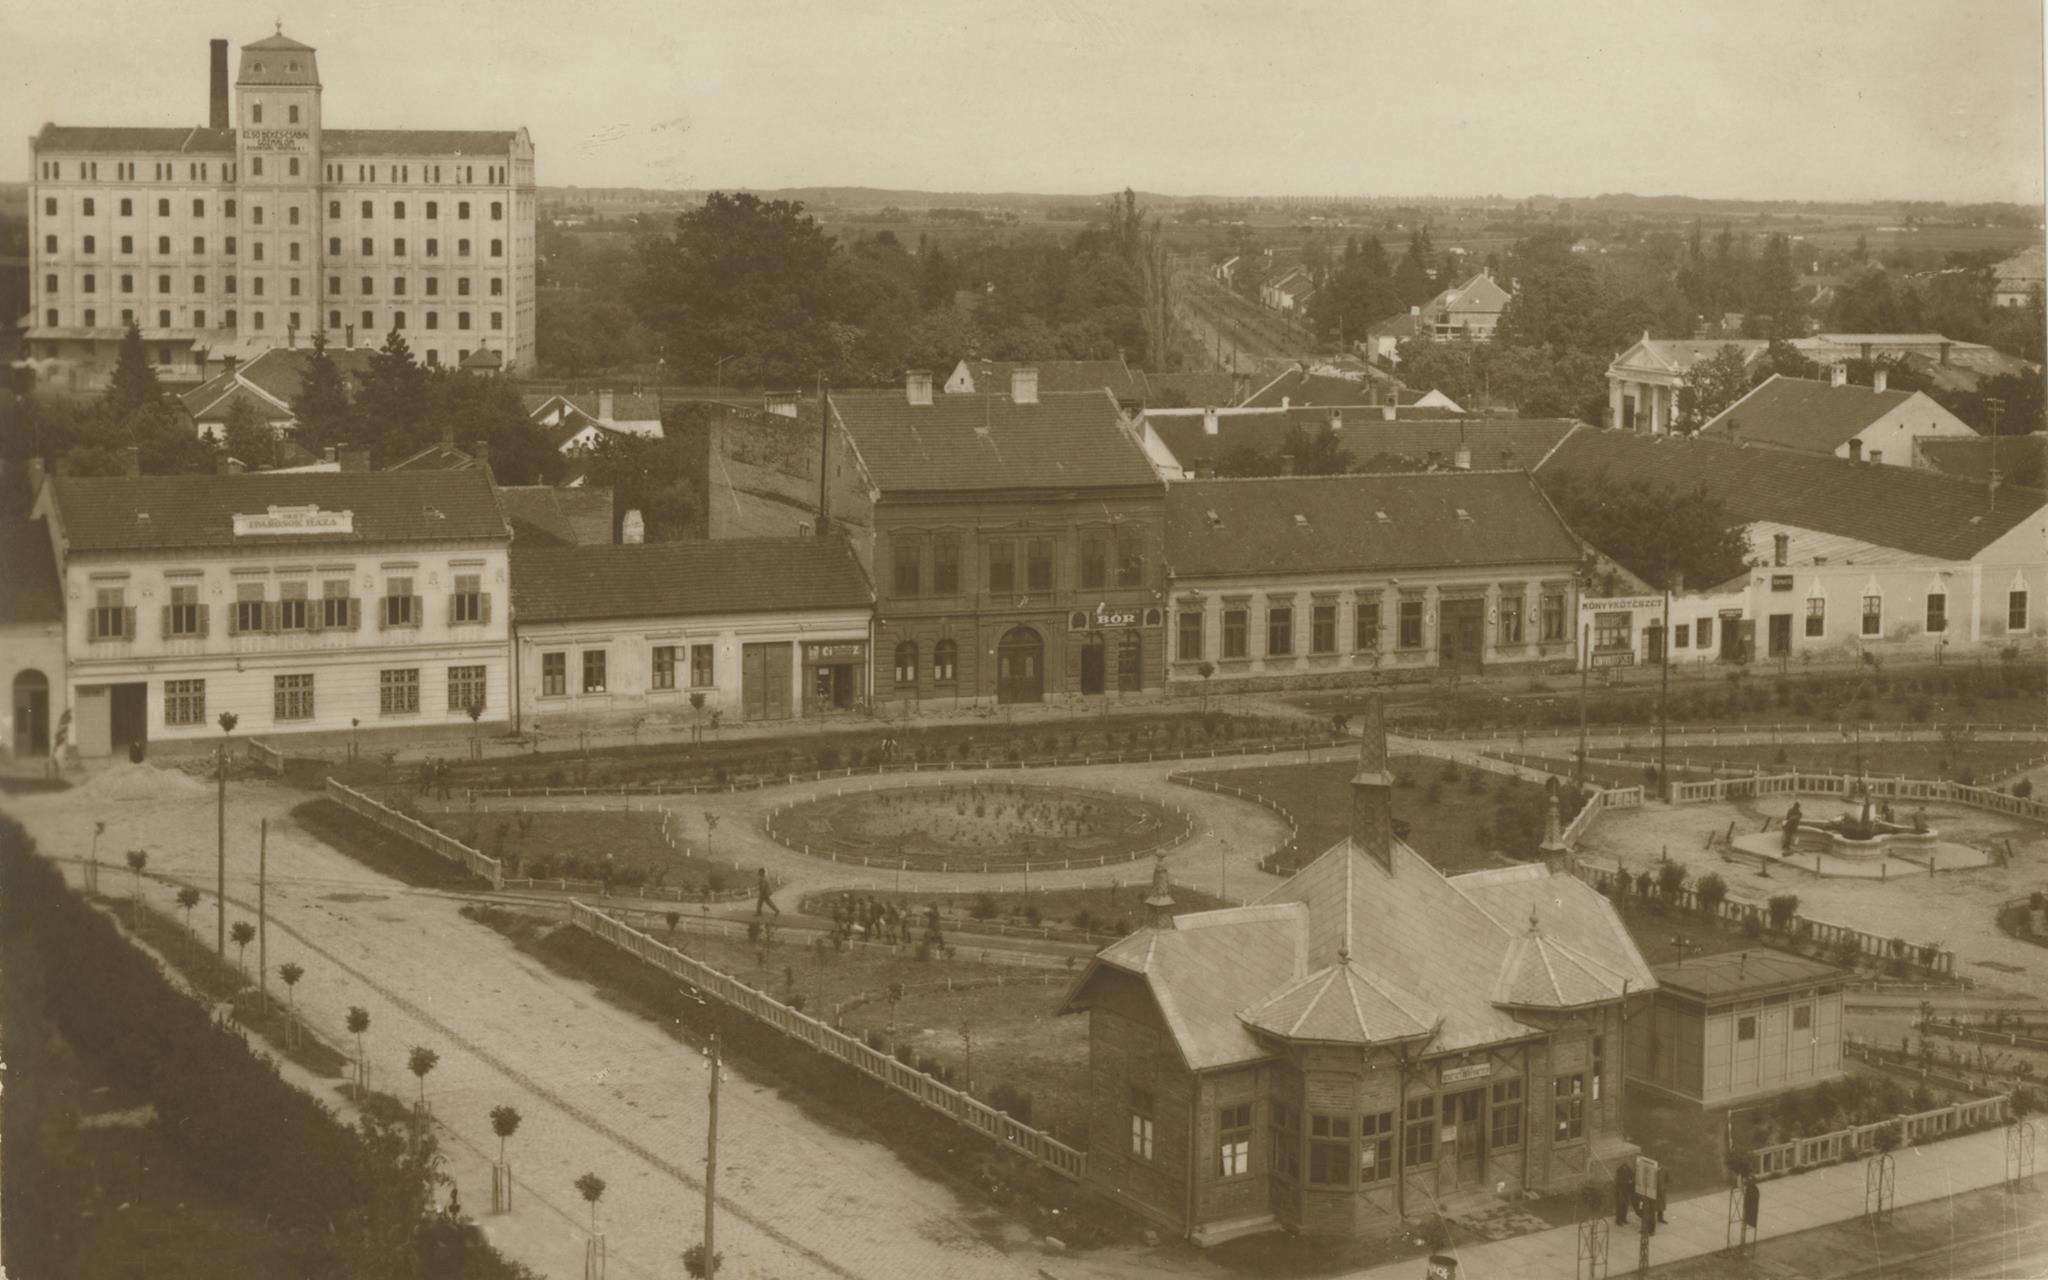 A békéscsabai Kossuth tér